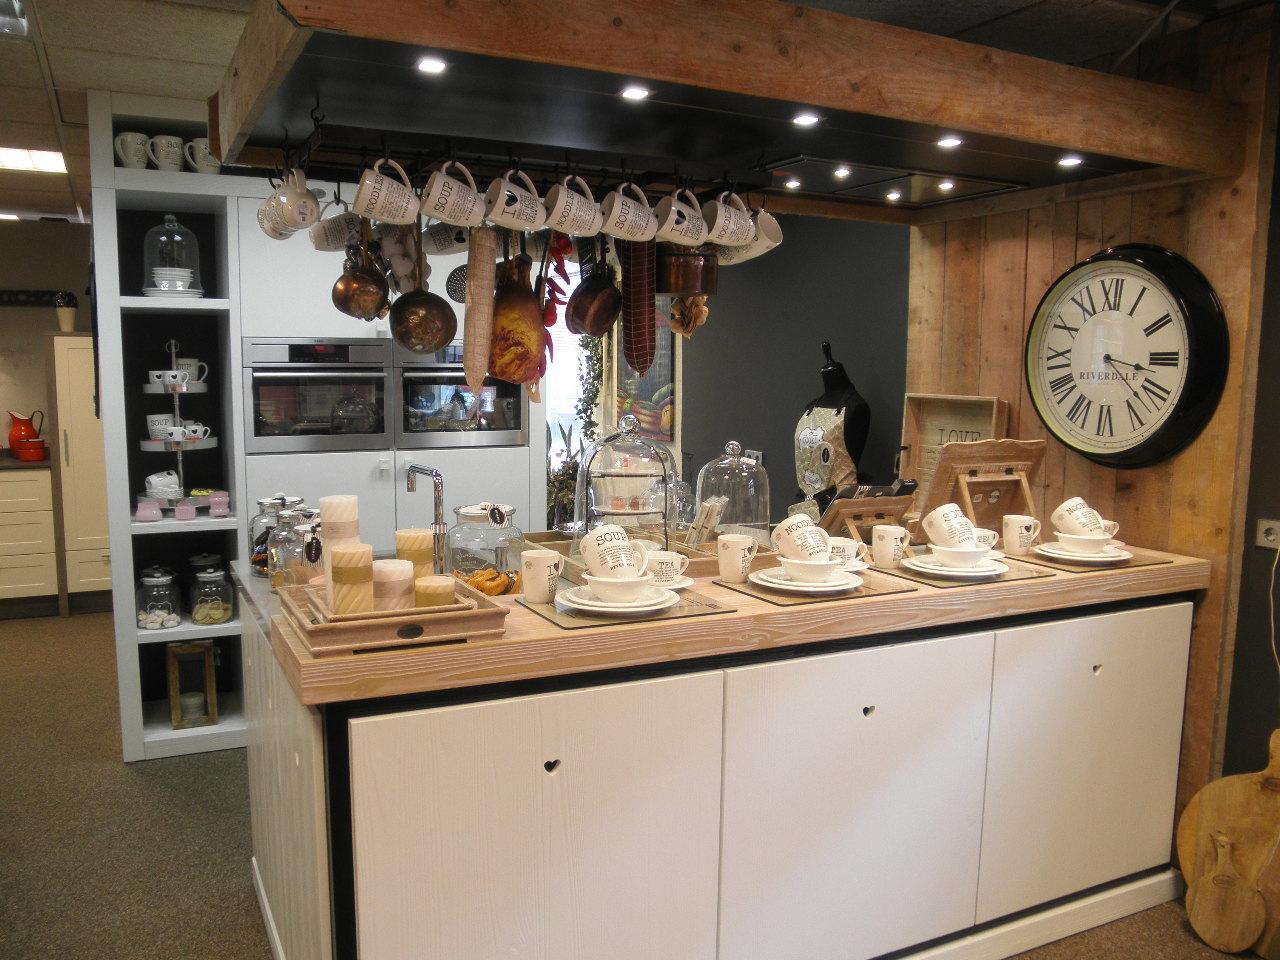 Riverdale Keuken Servies : Riverdale keuken met servies